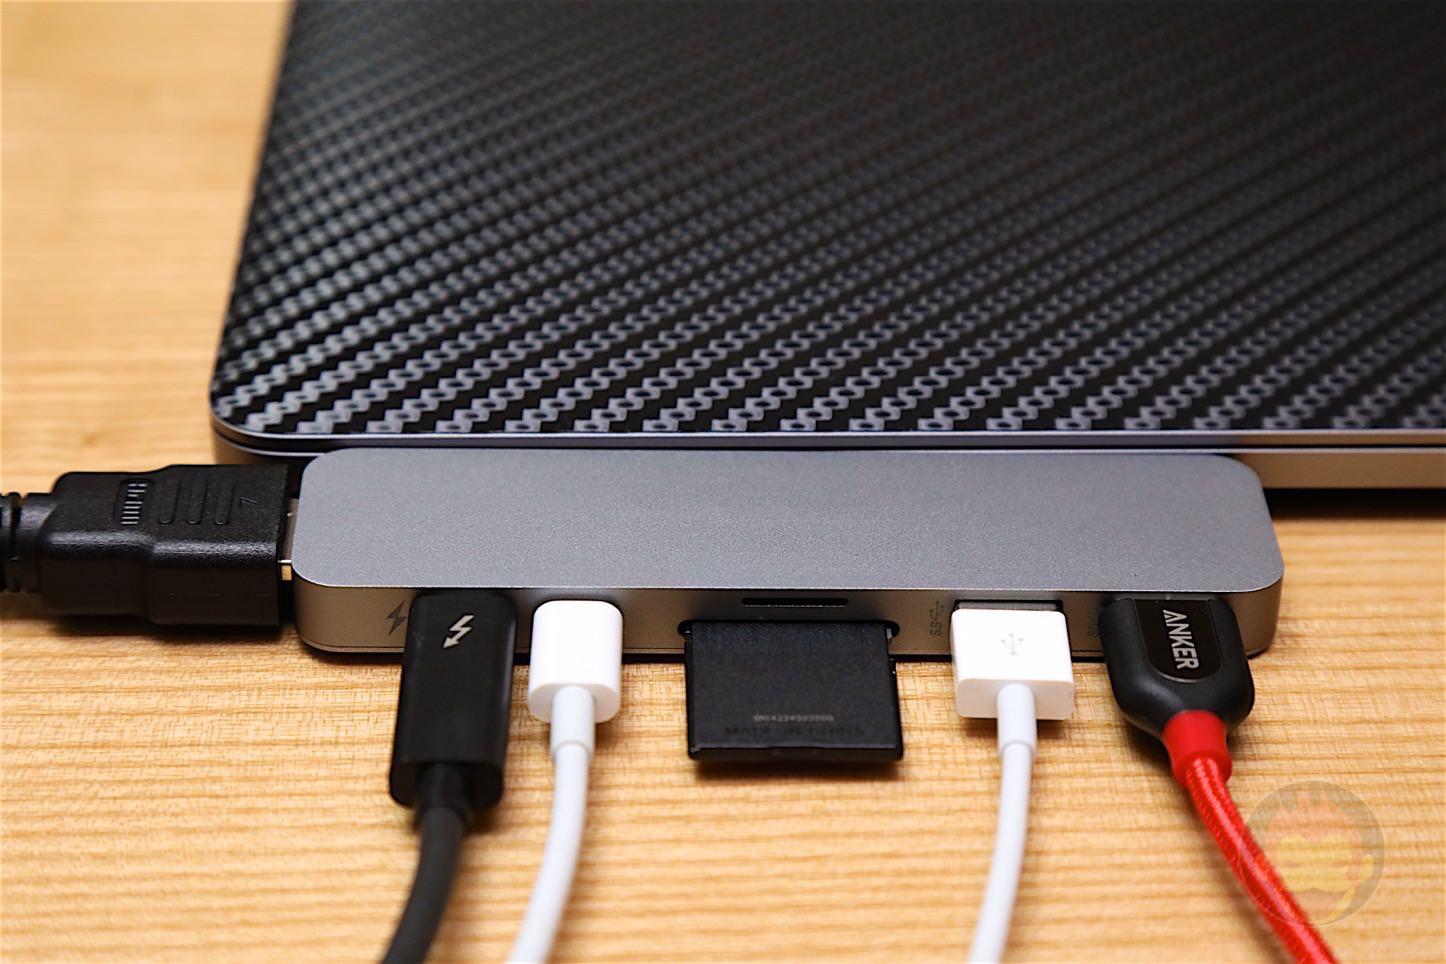 HyperDrive-Thunderbolt3-USBC-Hub-09.jpg